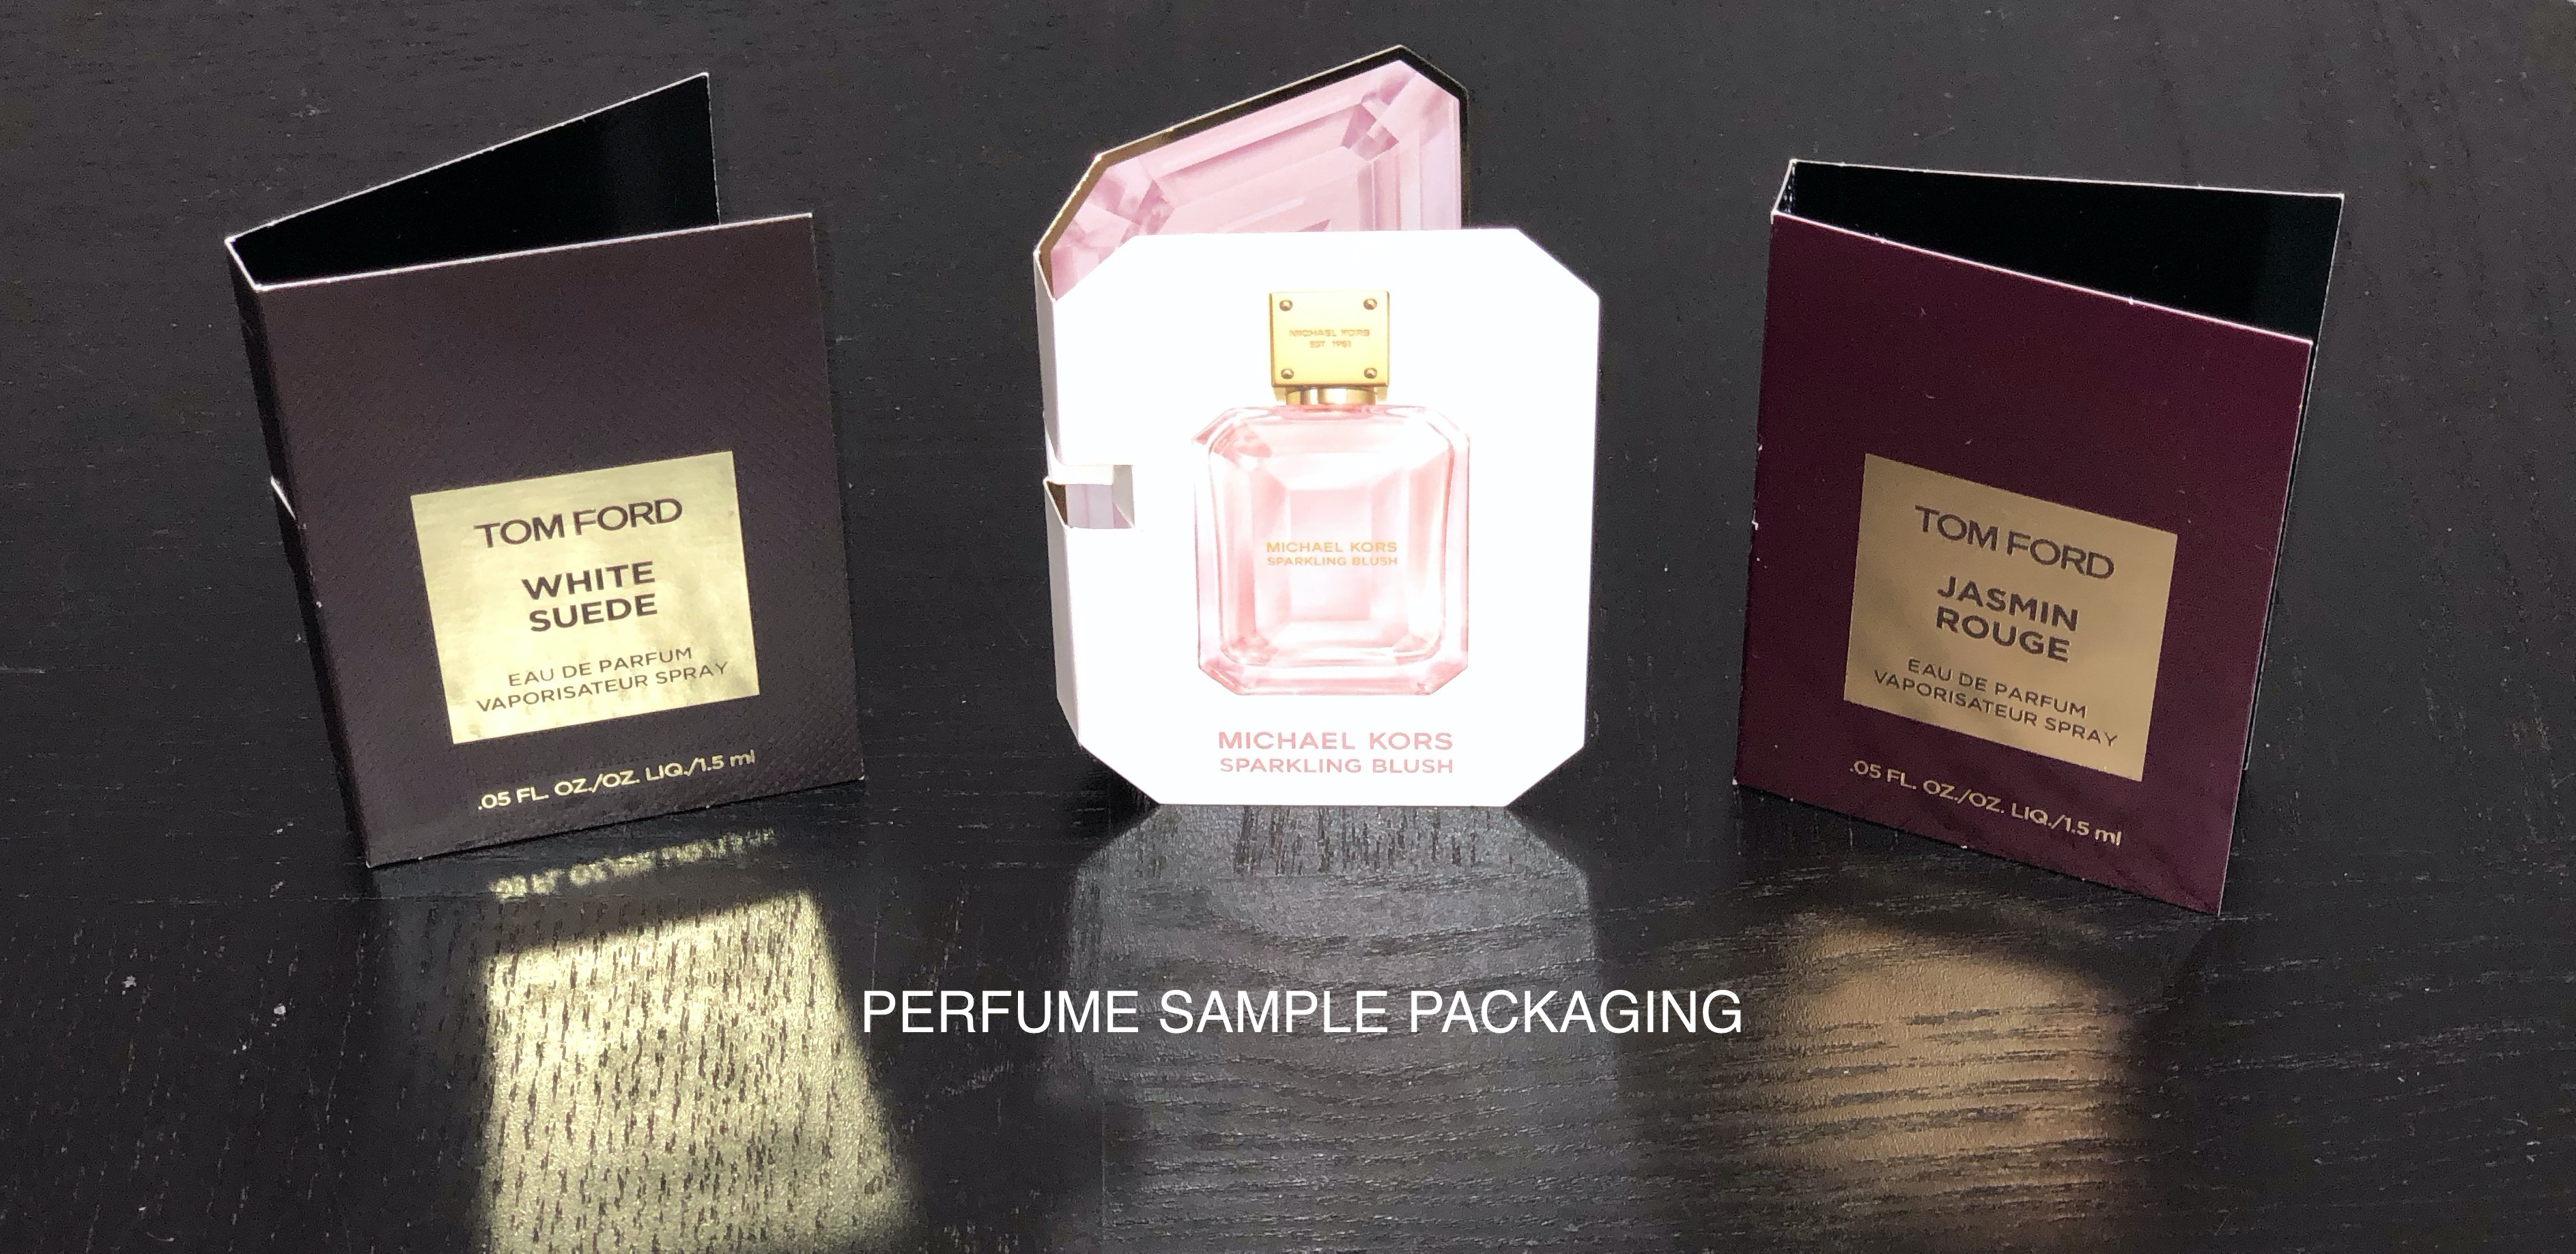 Perfume Sample Packaging - custom print